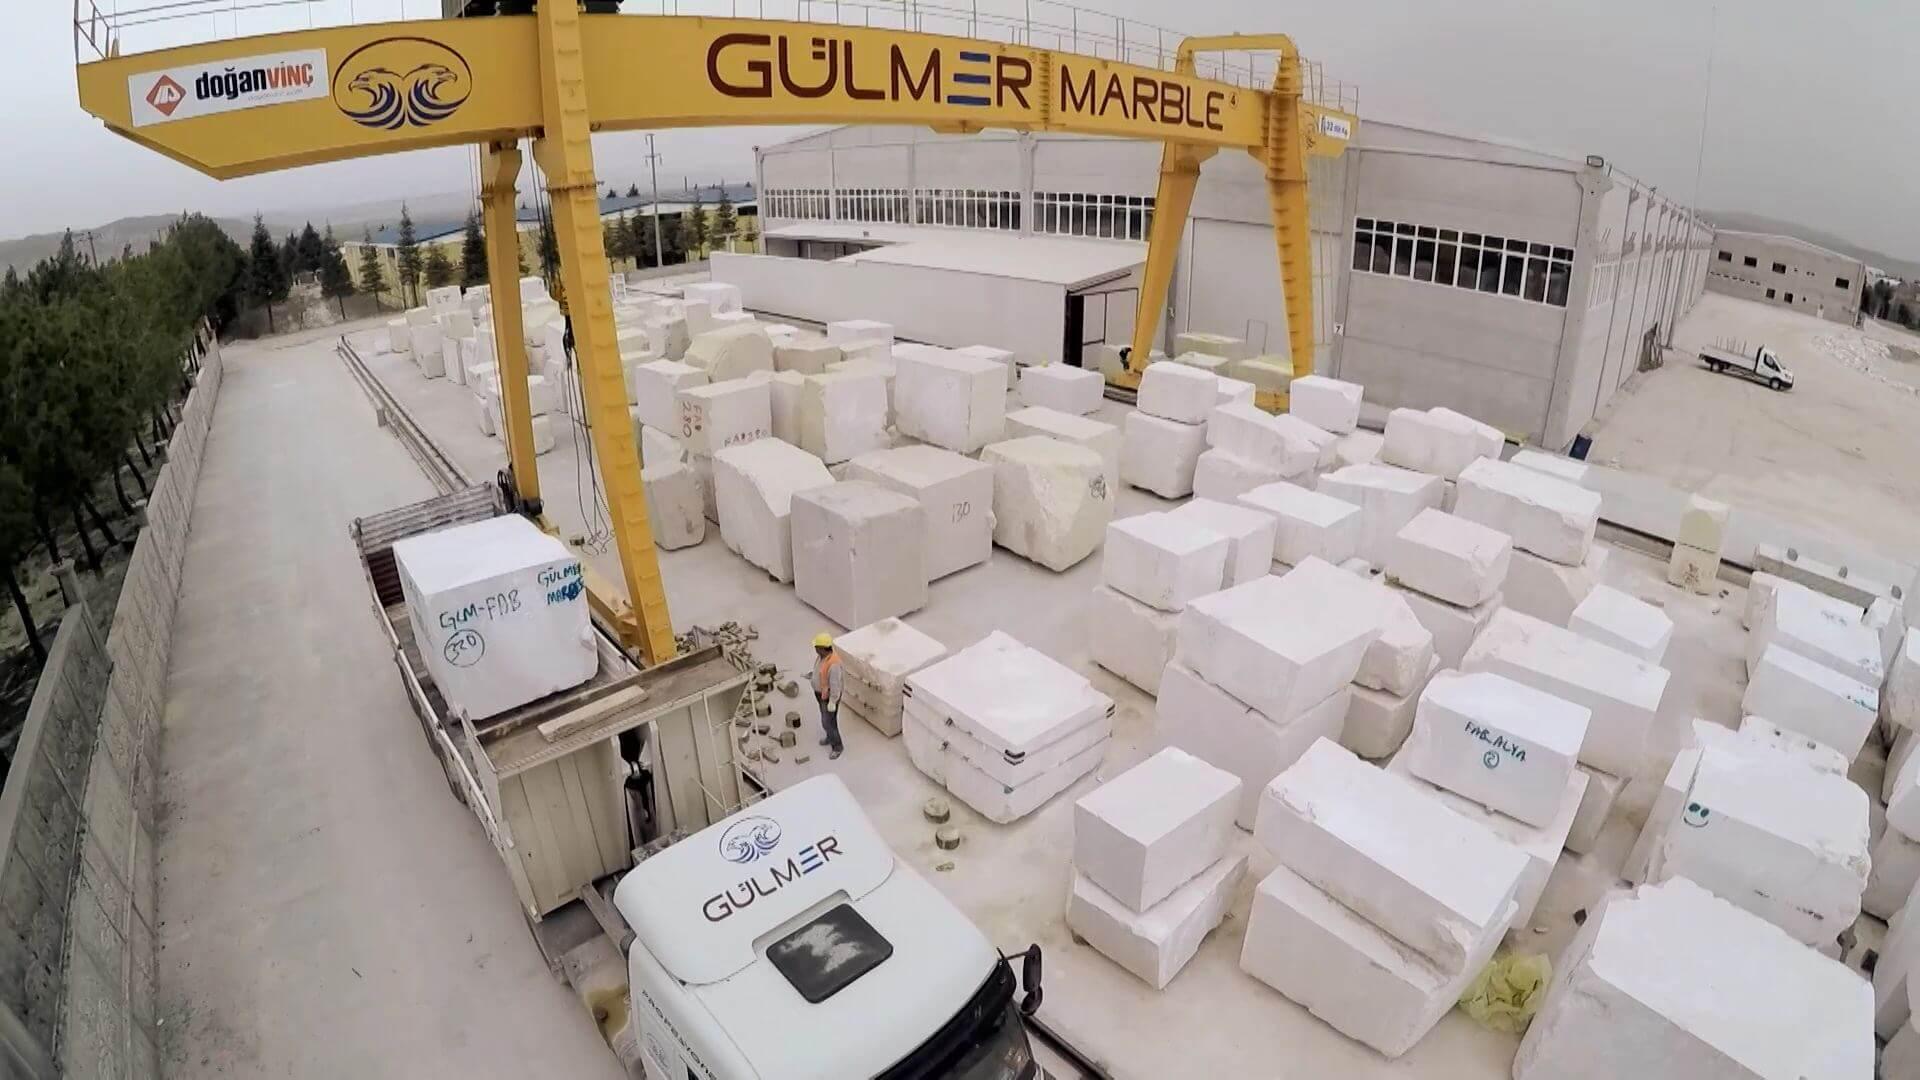 Gulmer Block Market